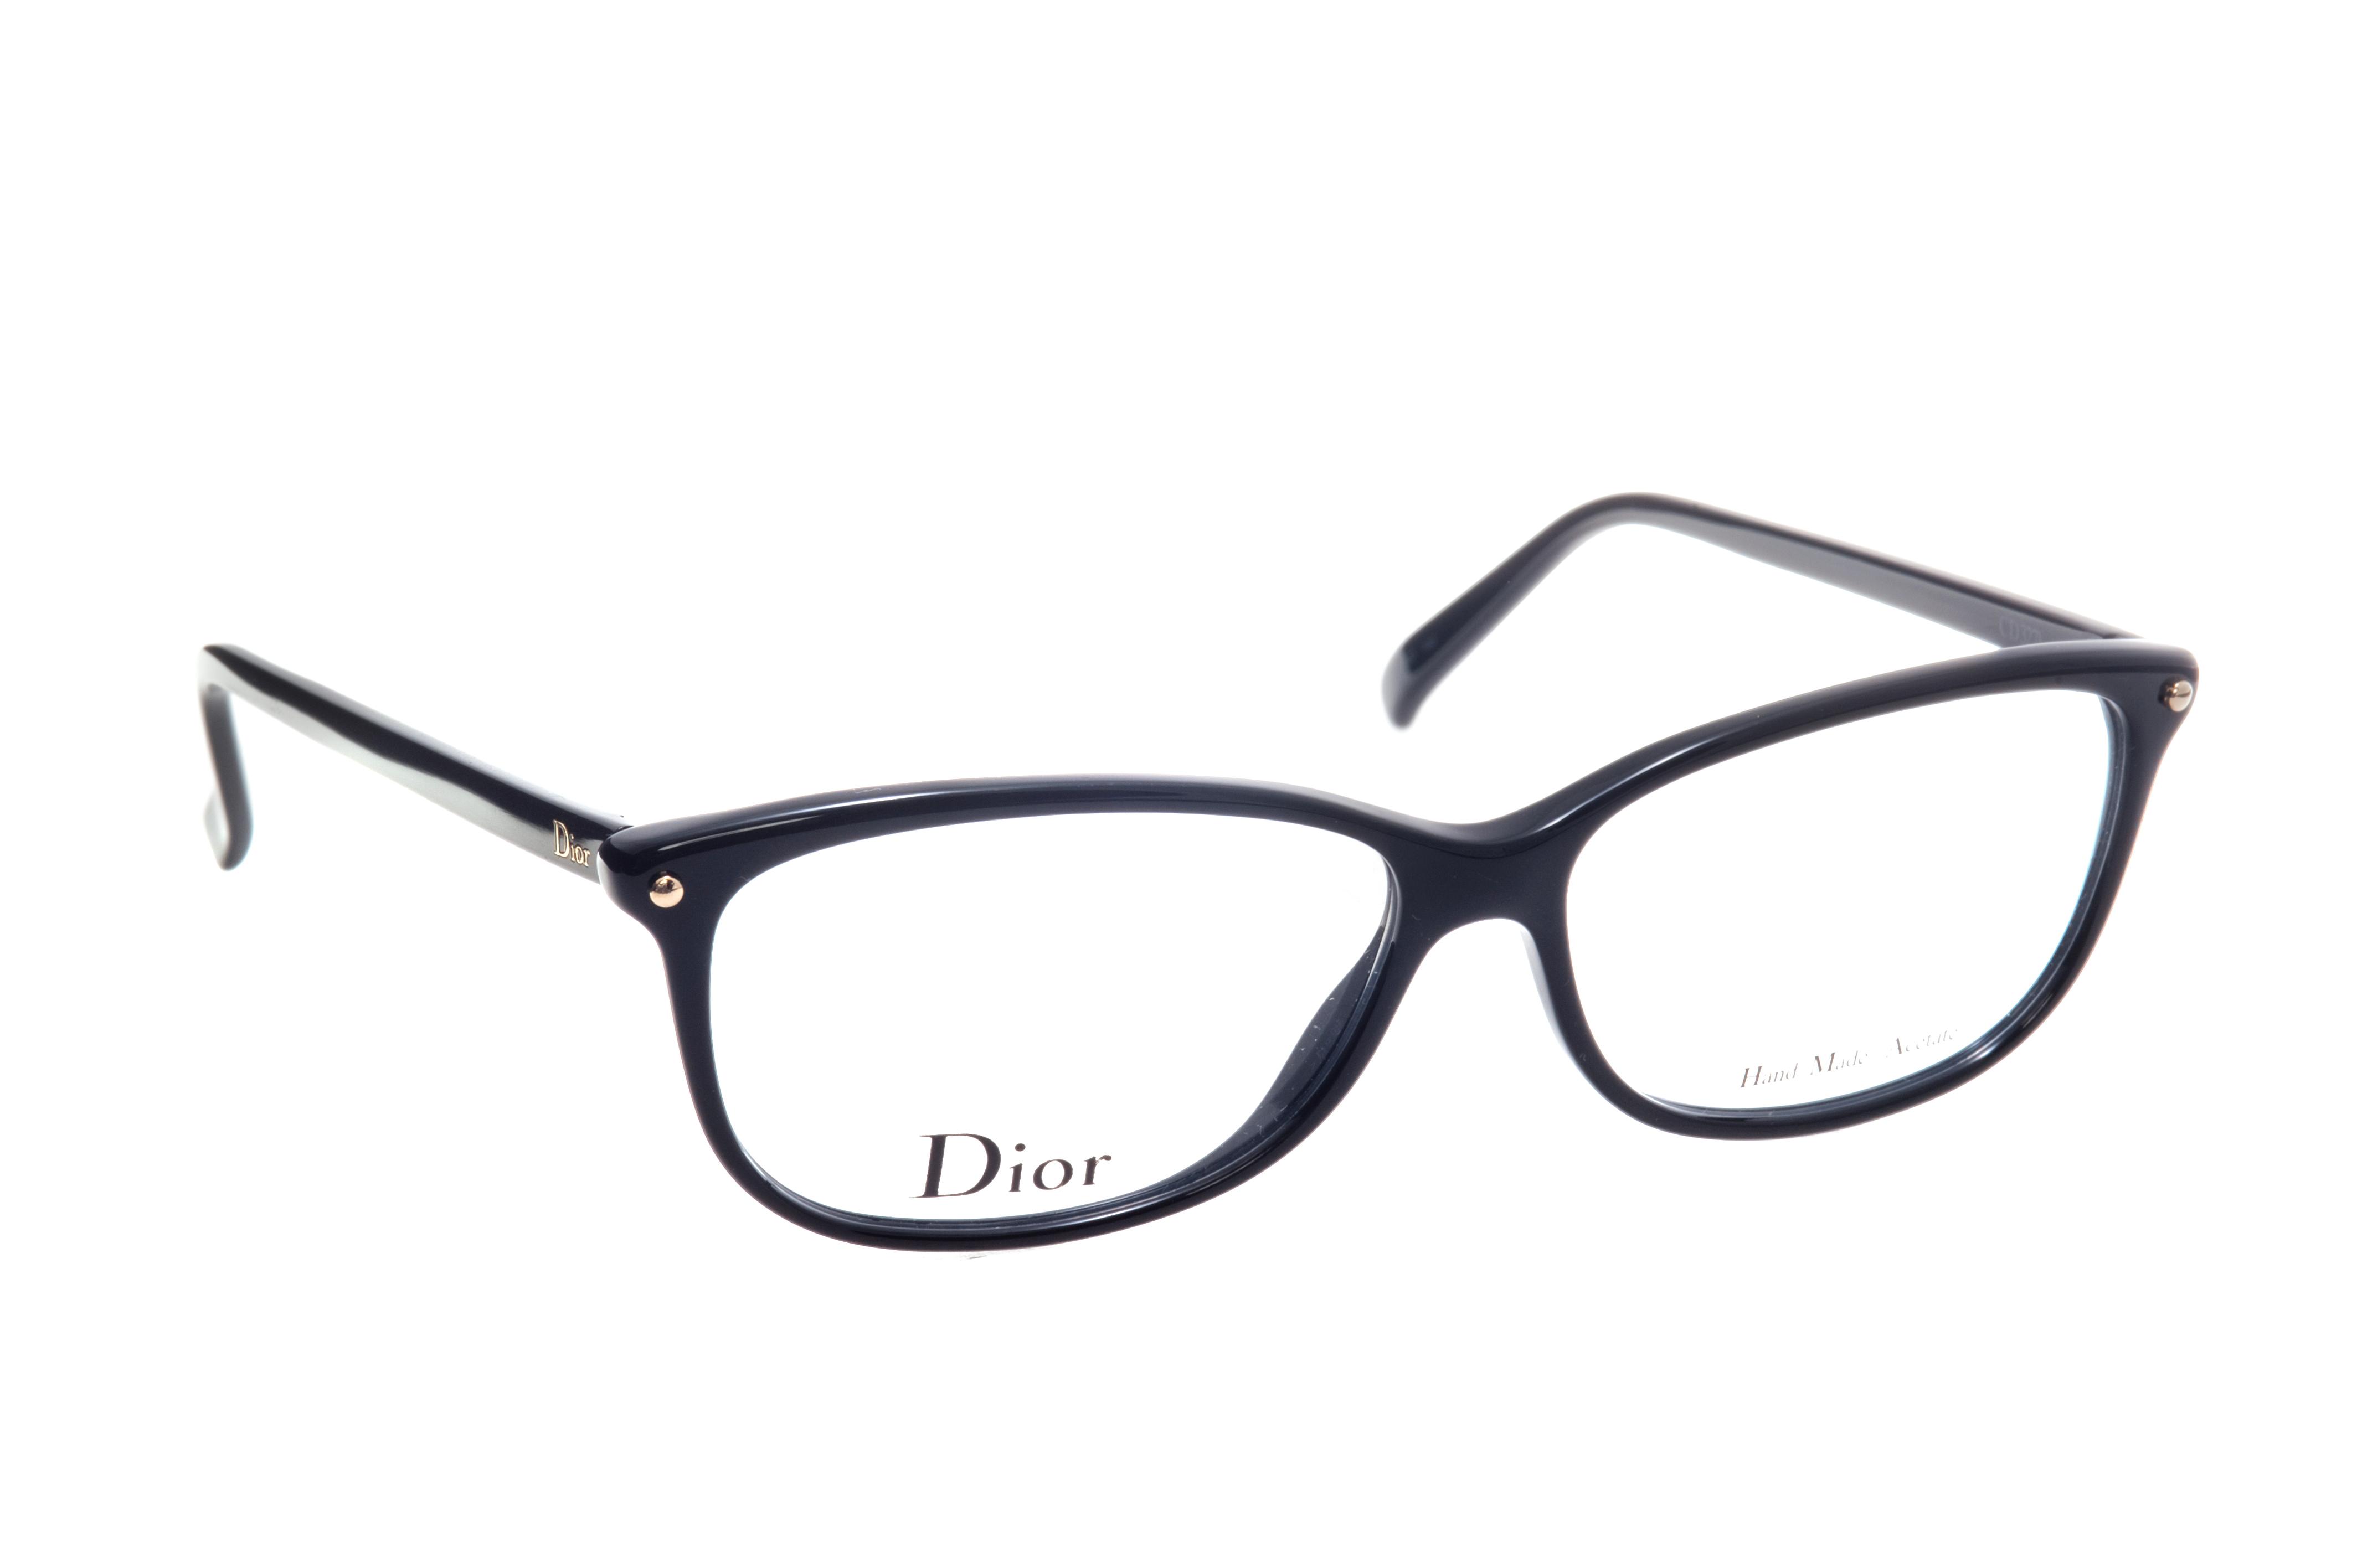 Dior CD3271 807